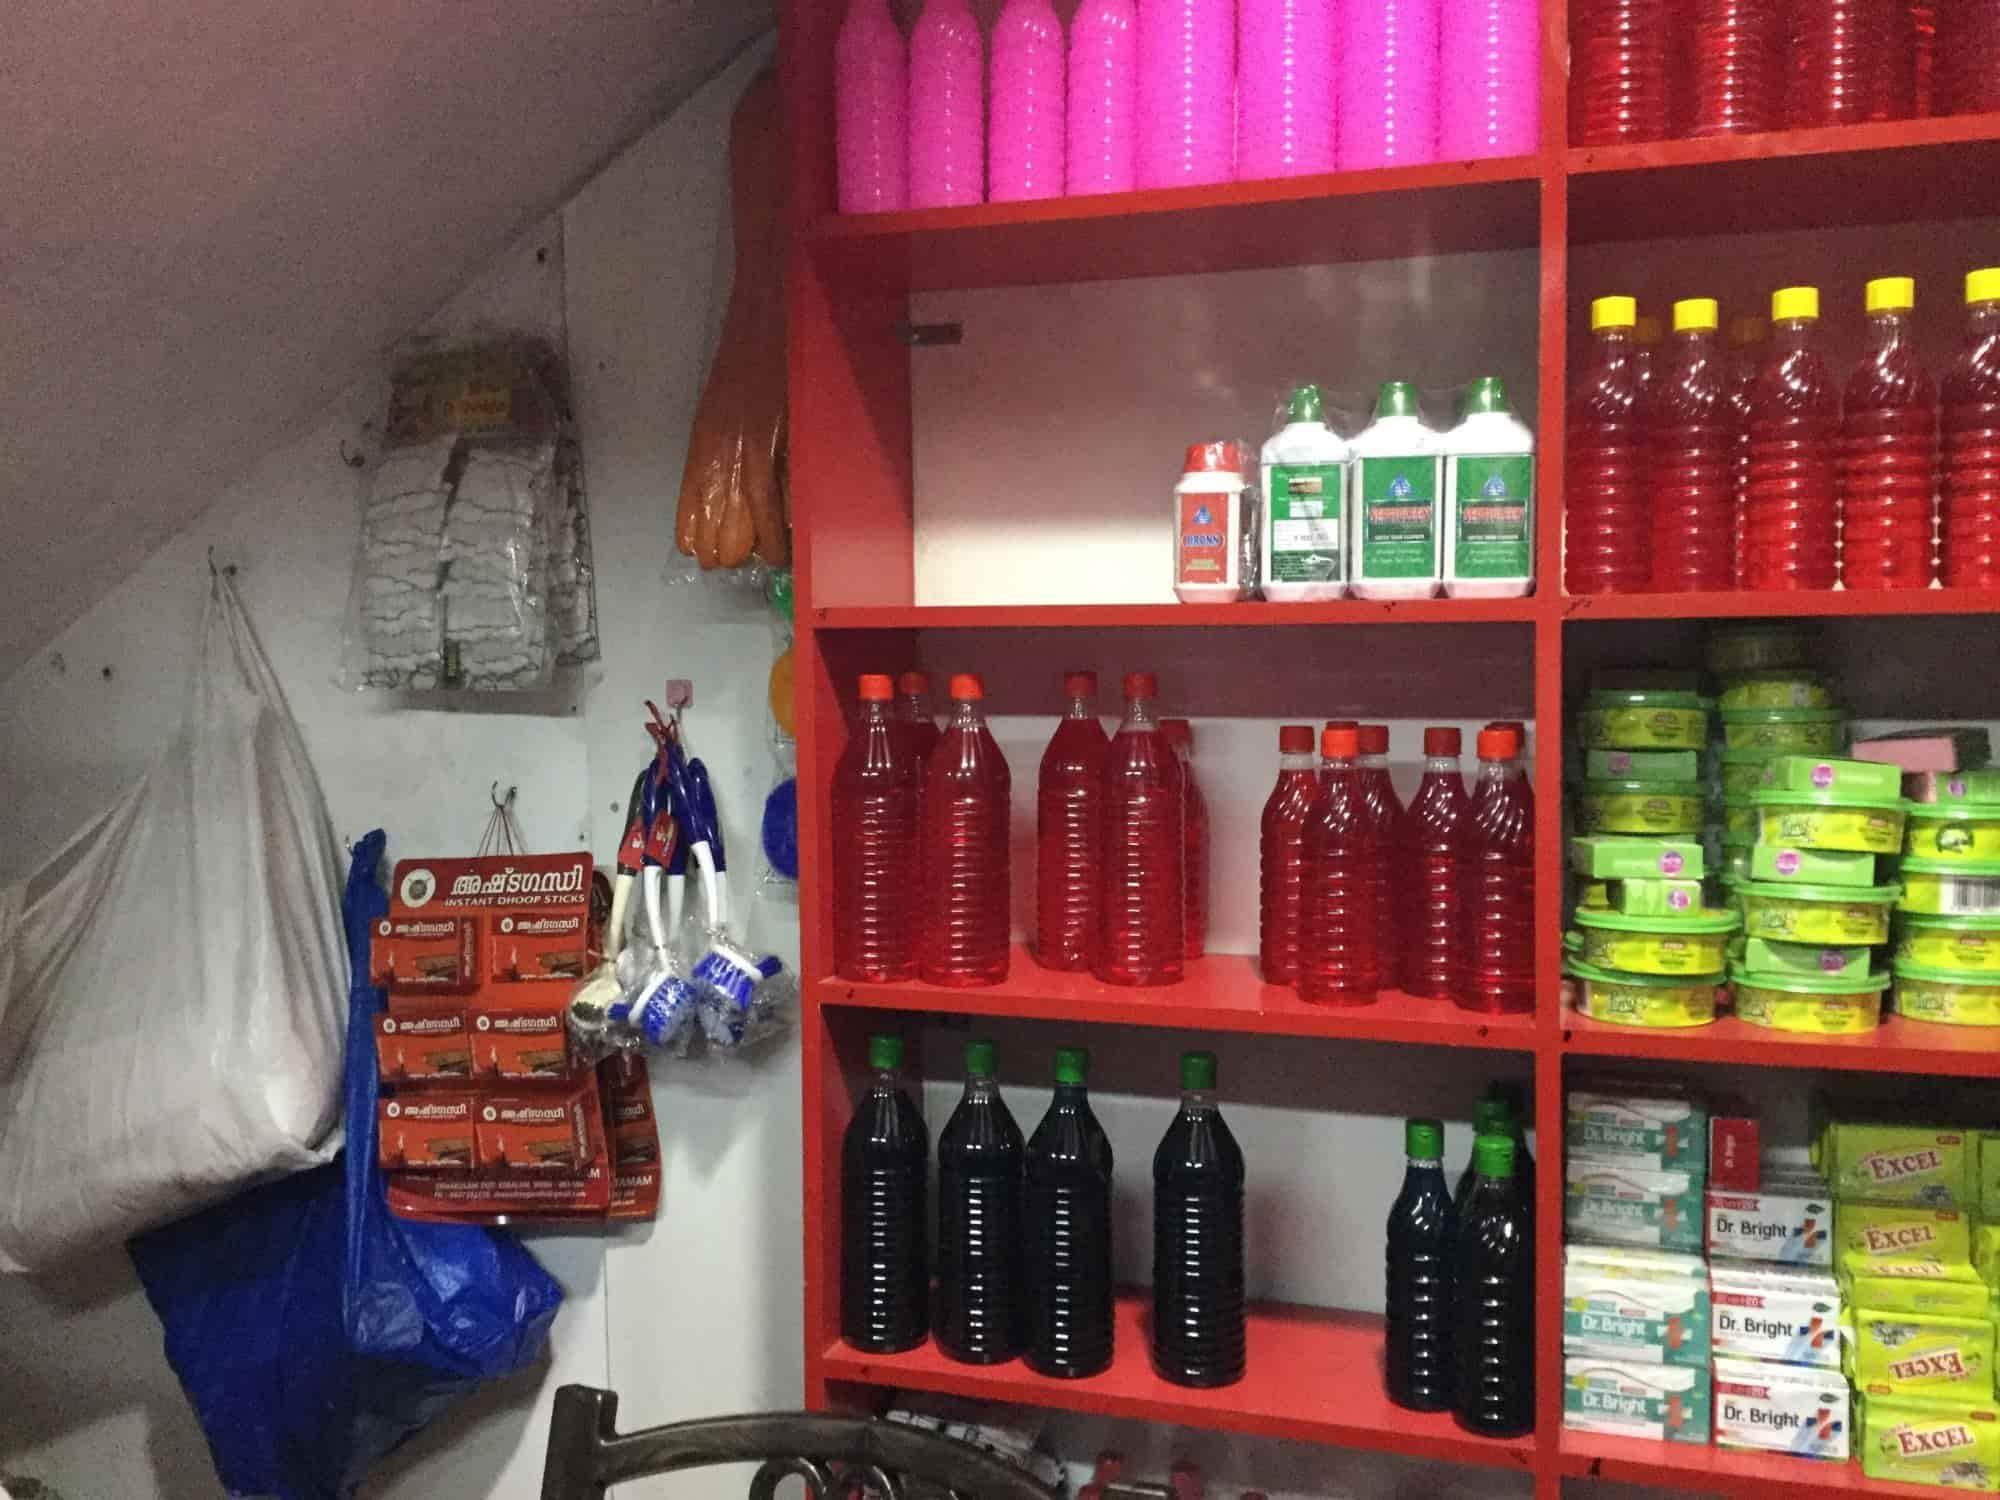 Top Phenyl Dealers in Kochi - Best Phenyl Suppliers